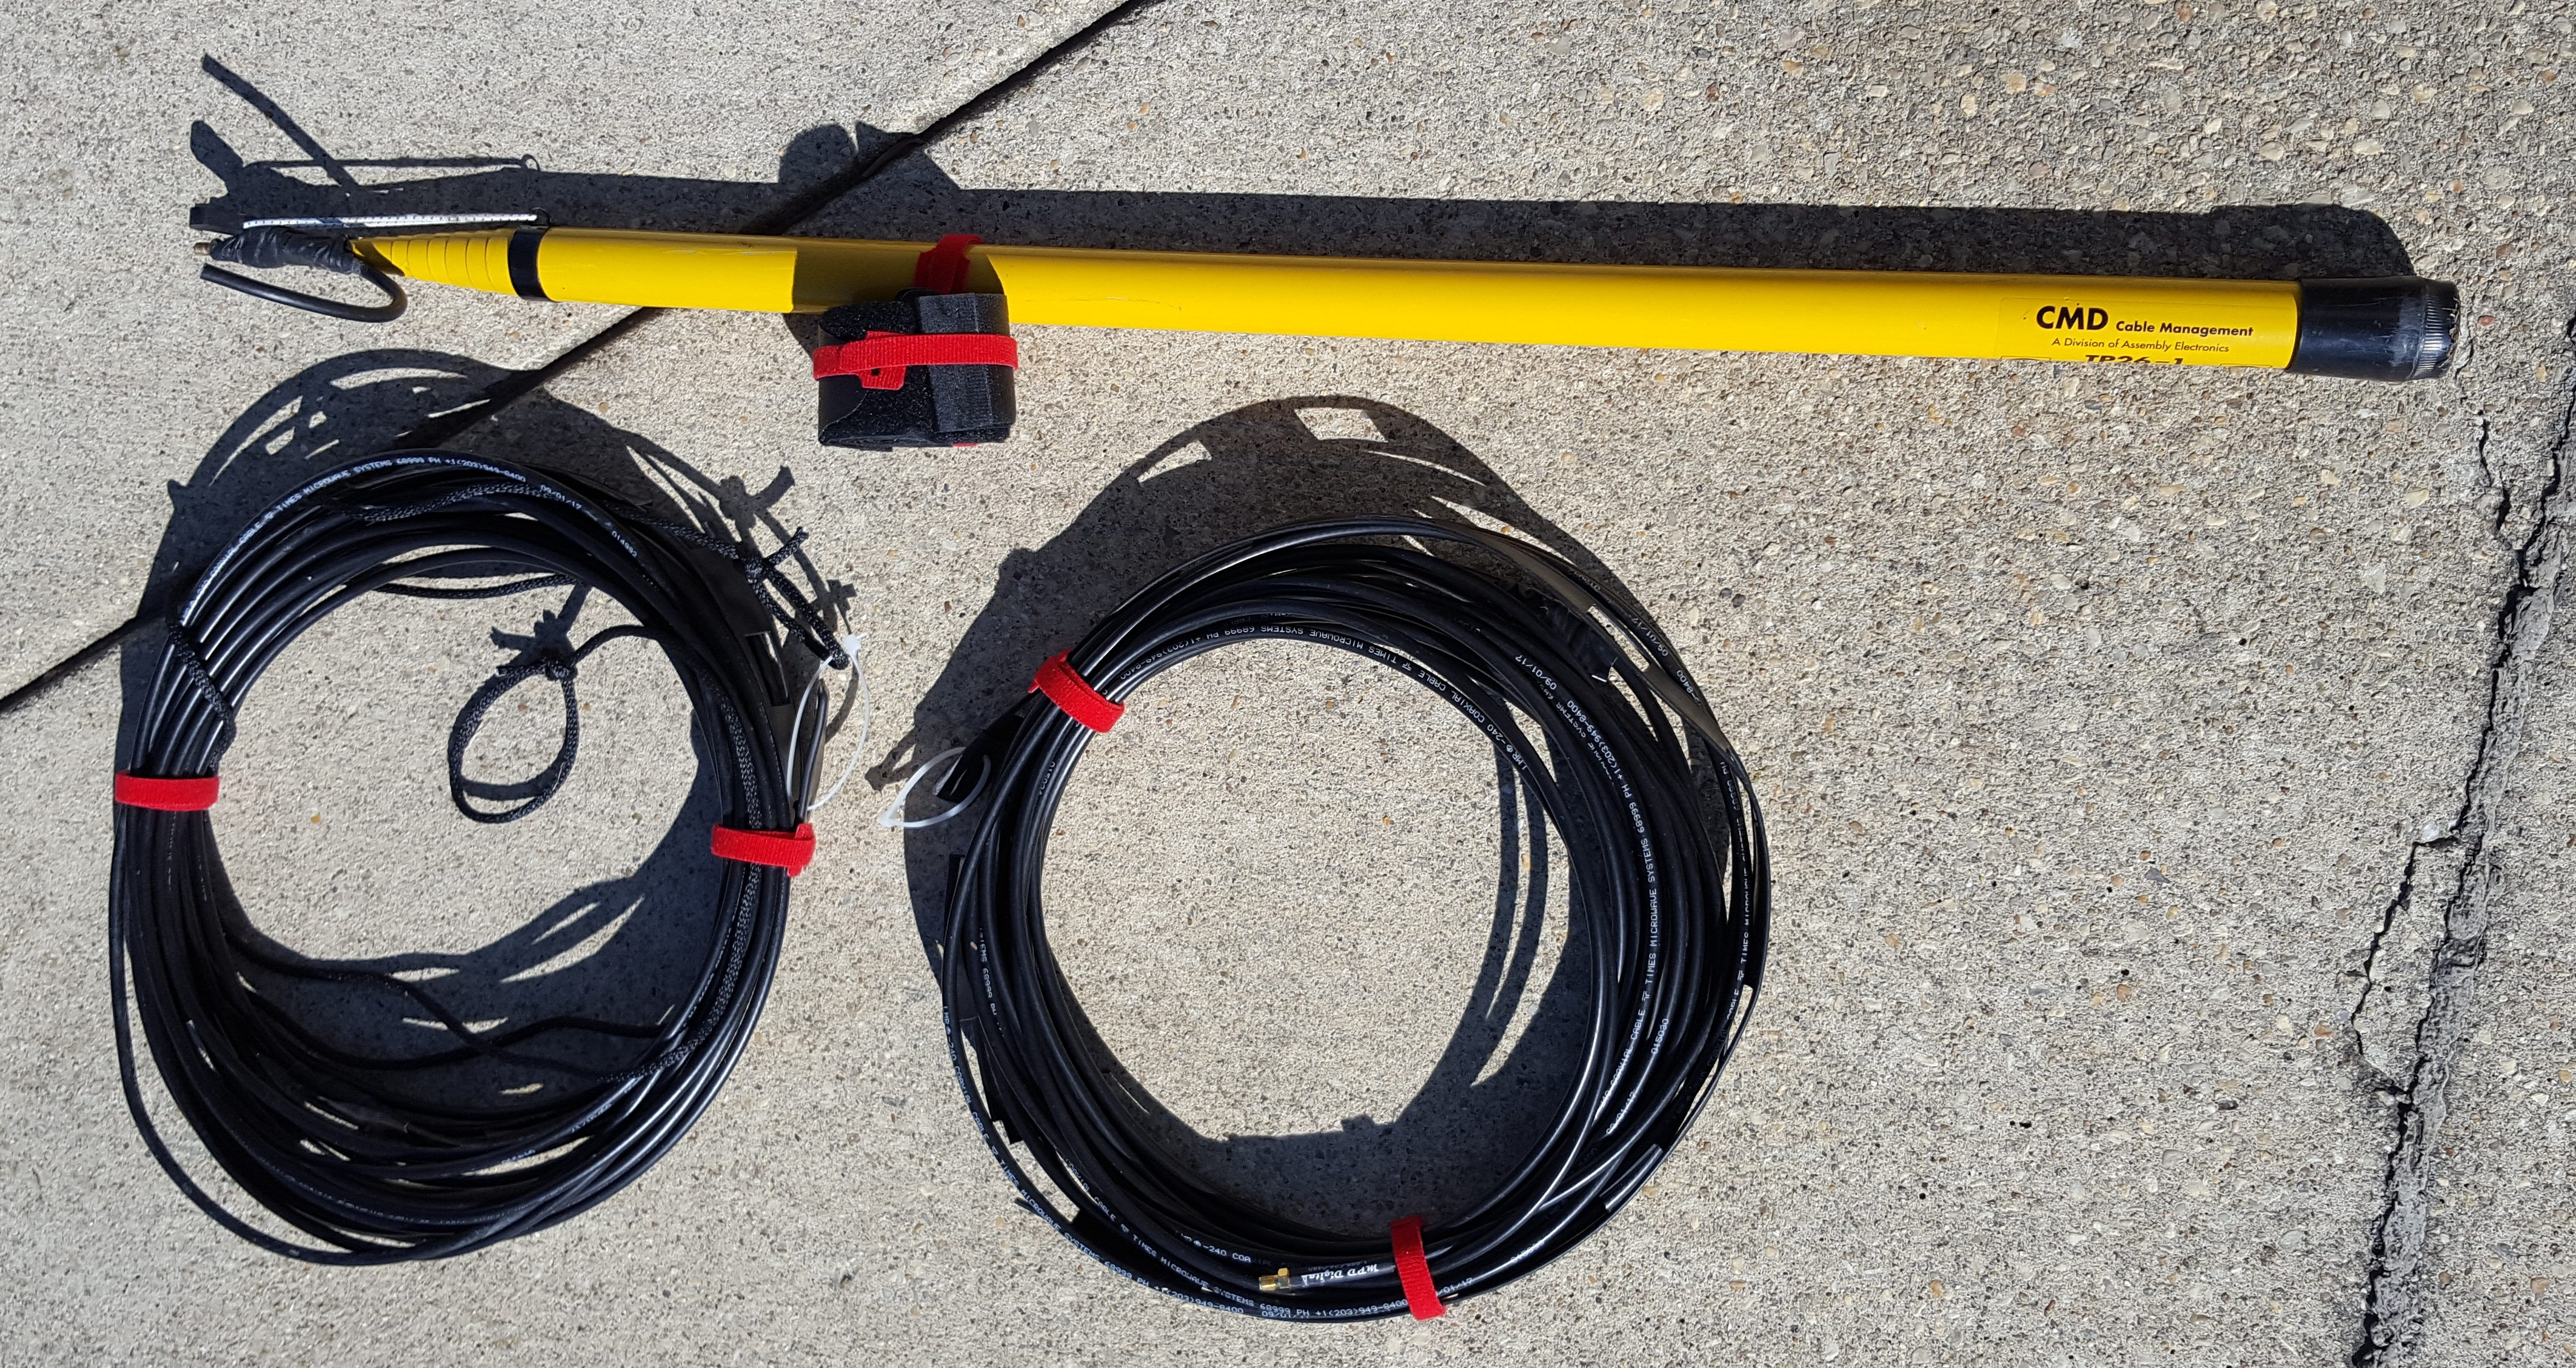 J-Pole antennas for SAR